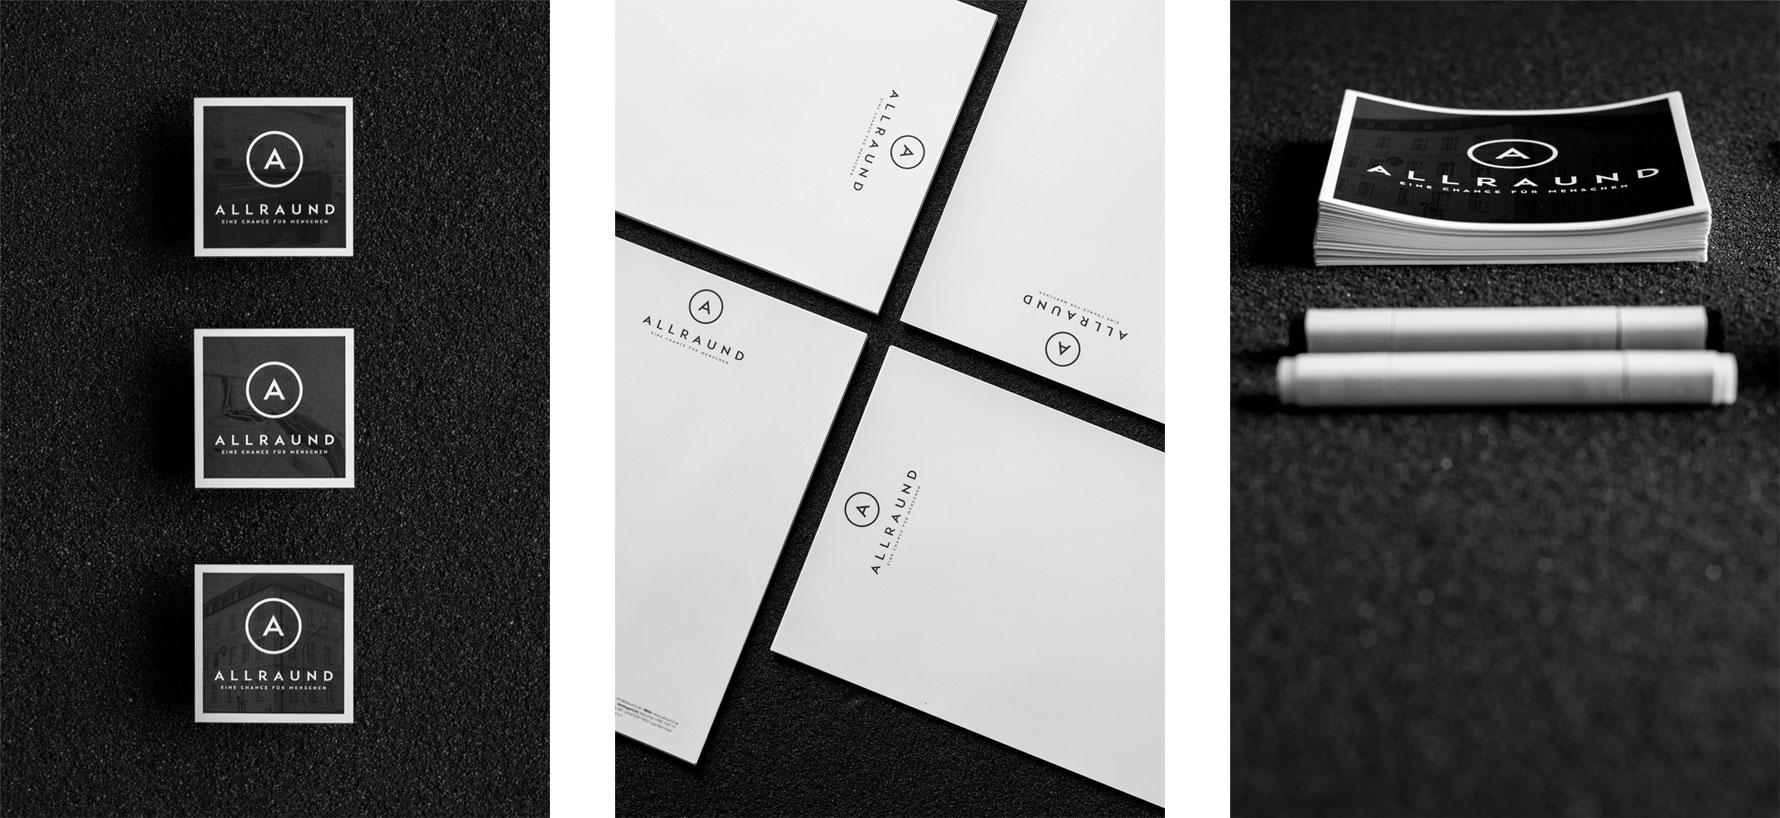 Hüfner Design | Referenz AllrAUnd gGmbH | Corporate Identity